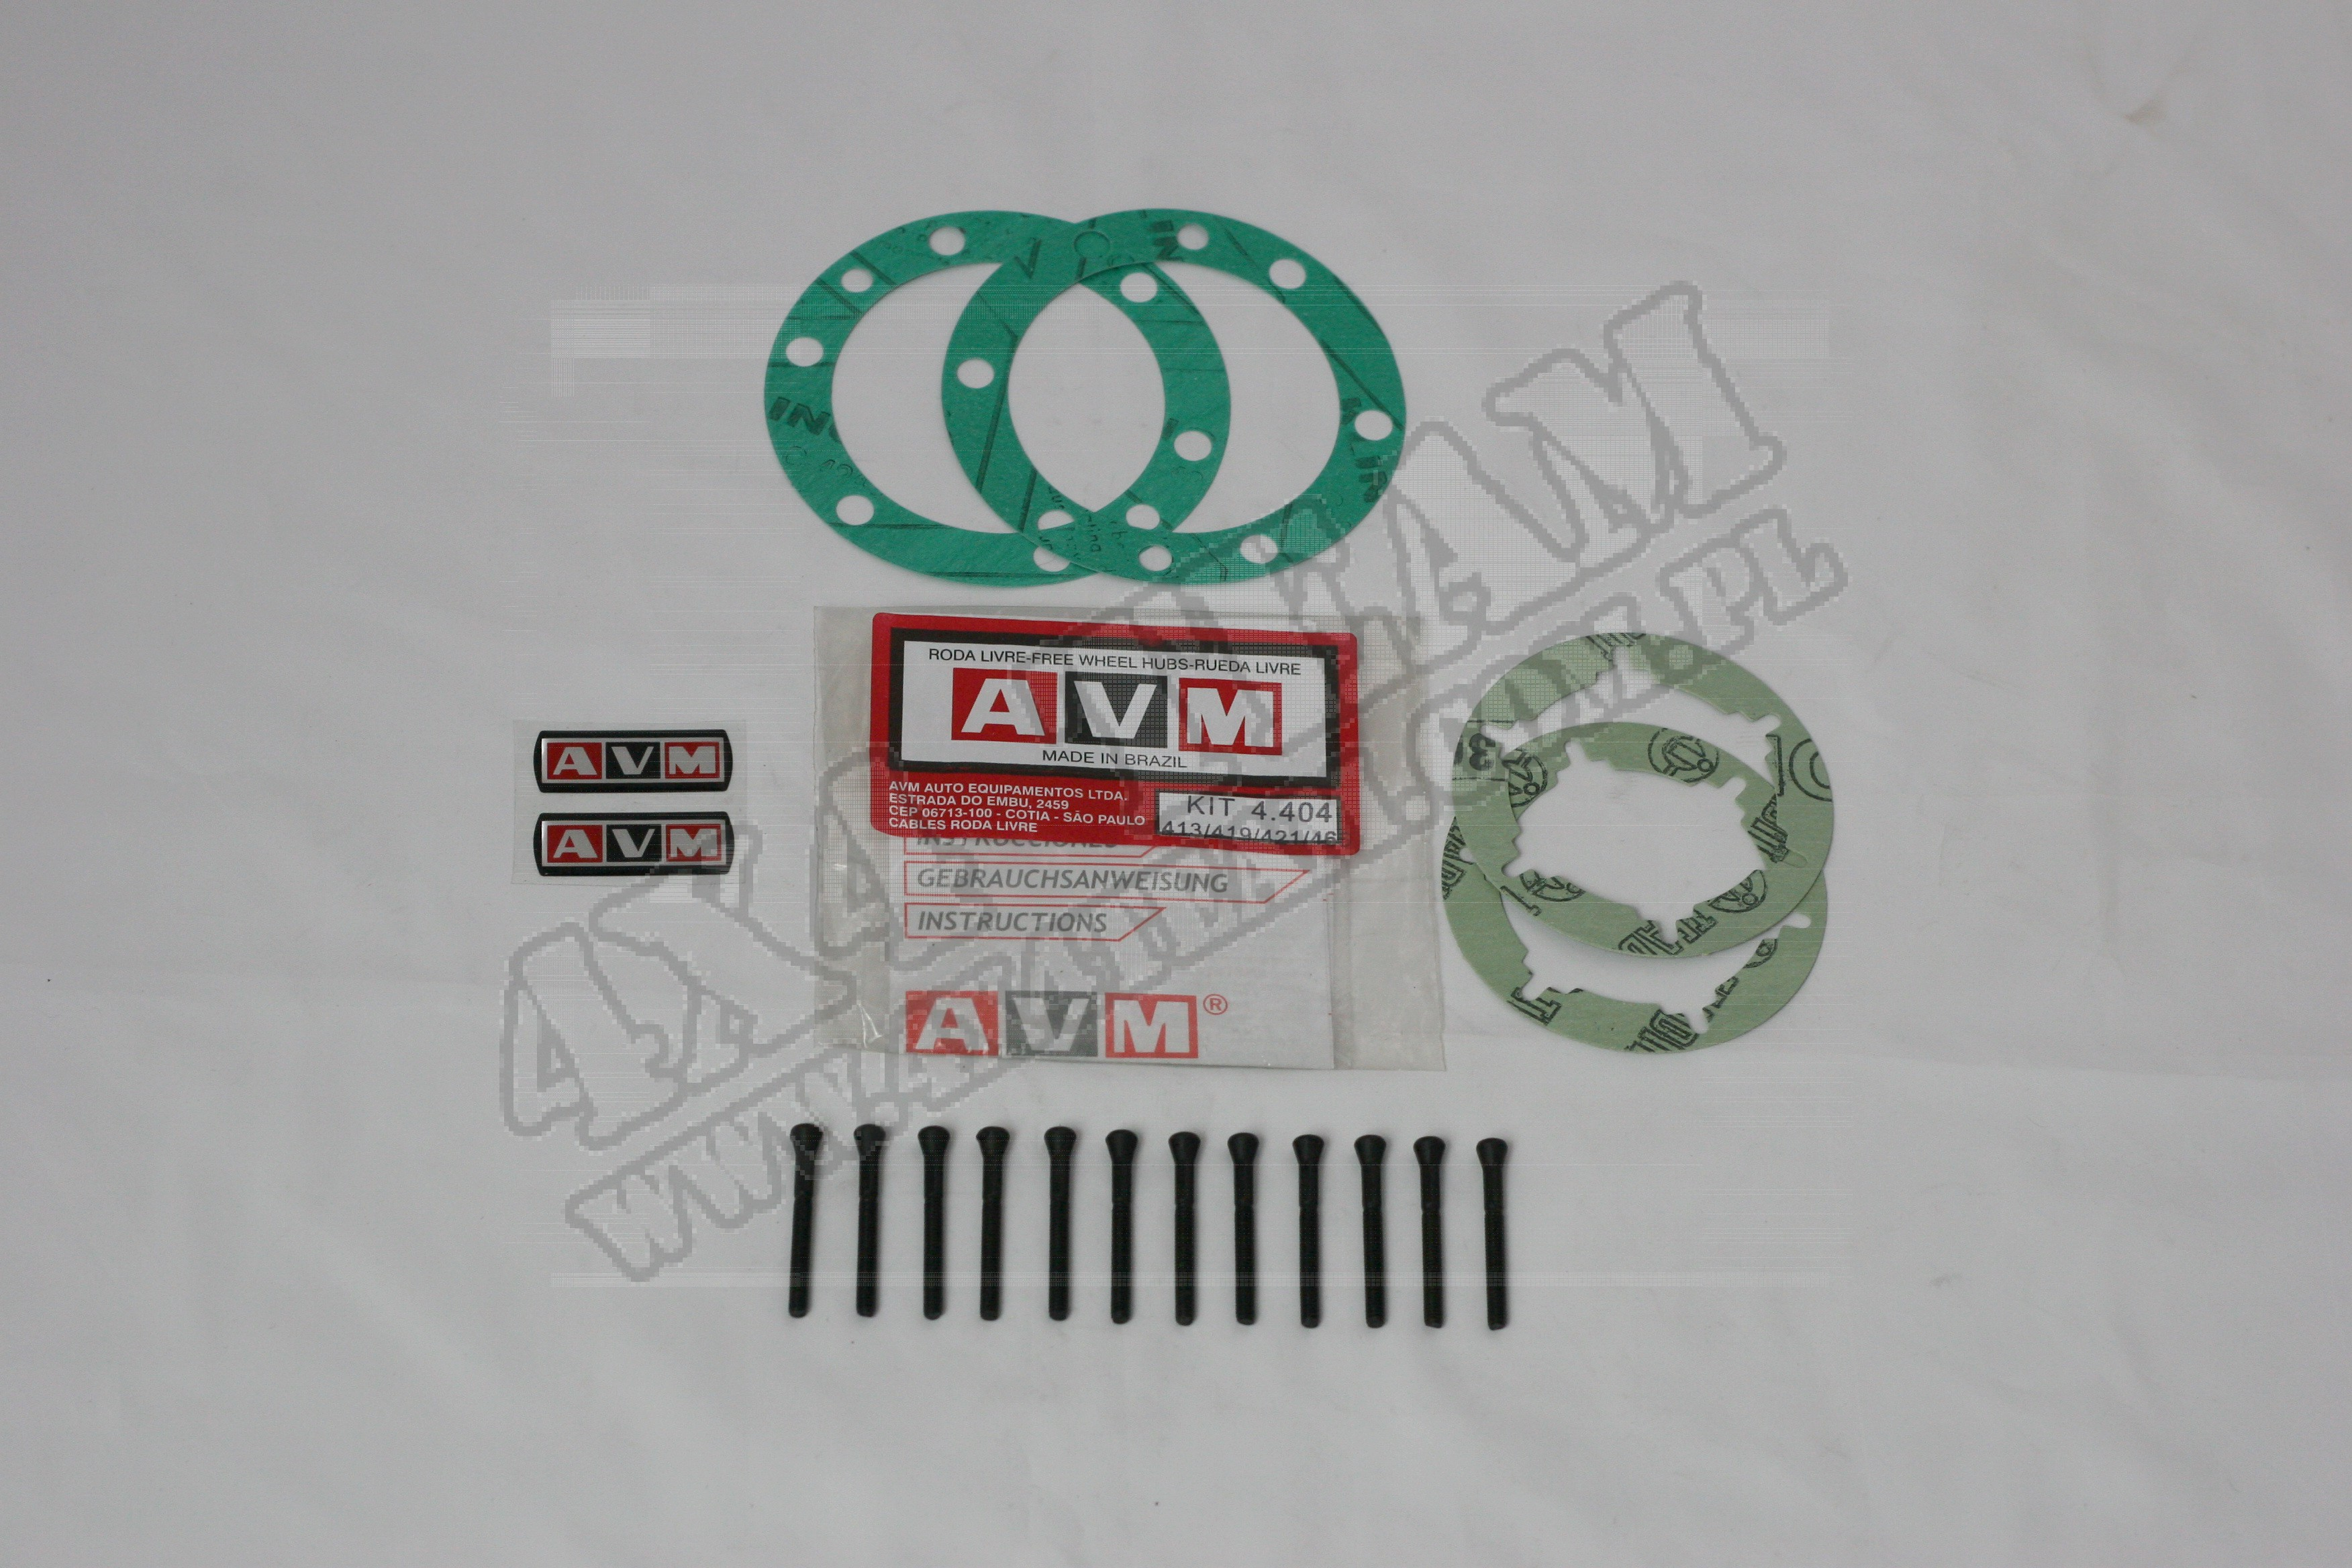 Zestaw serwisowy AVM 4.404